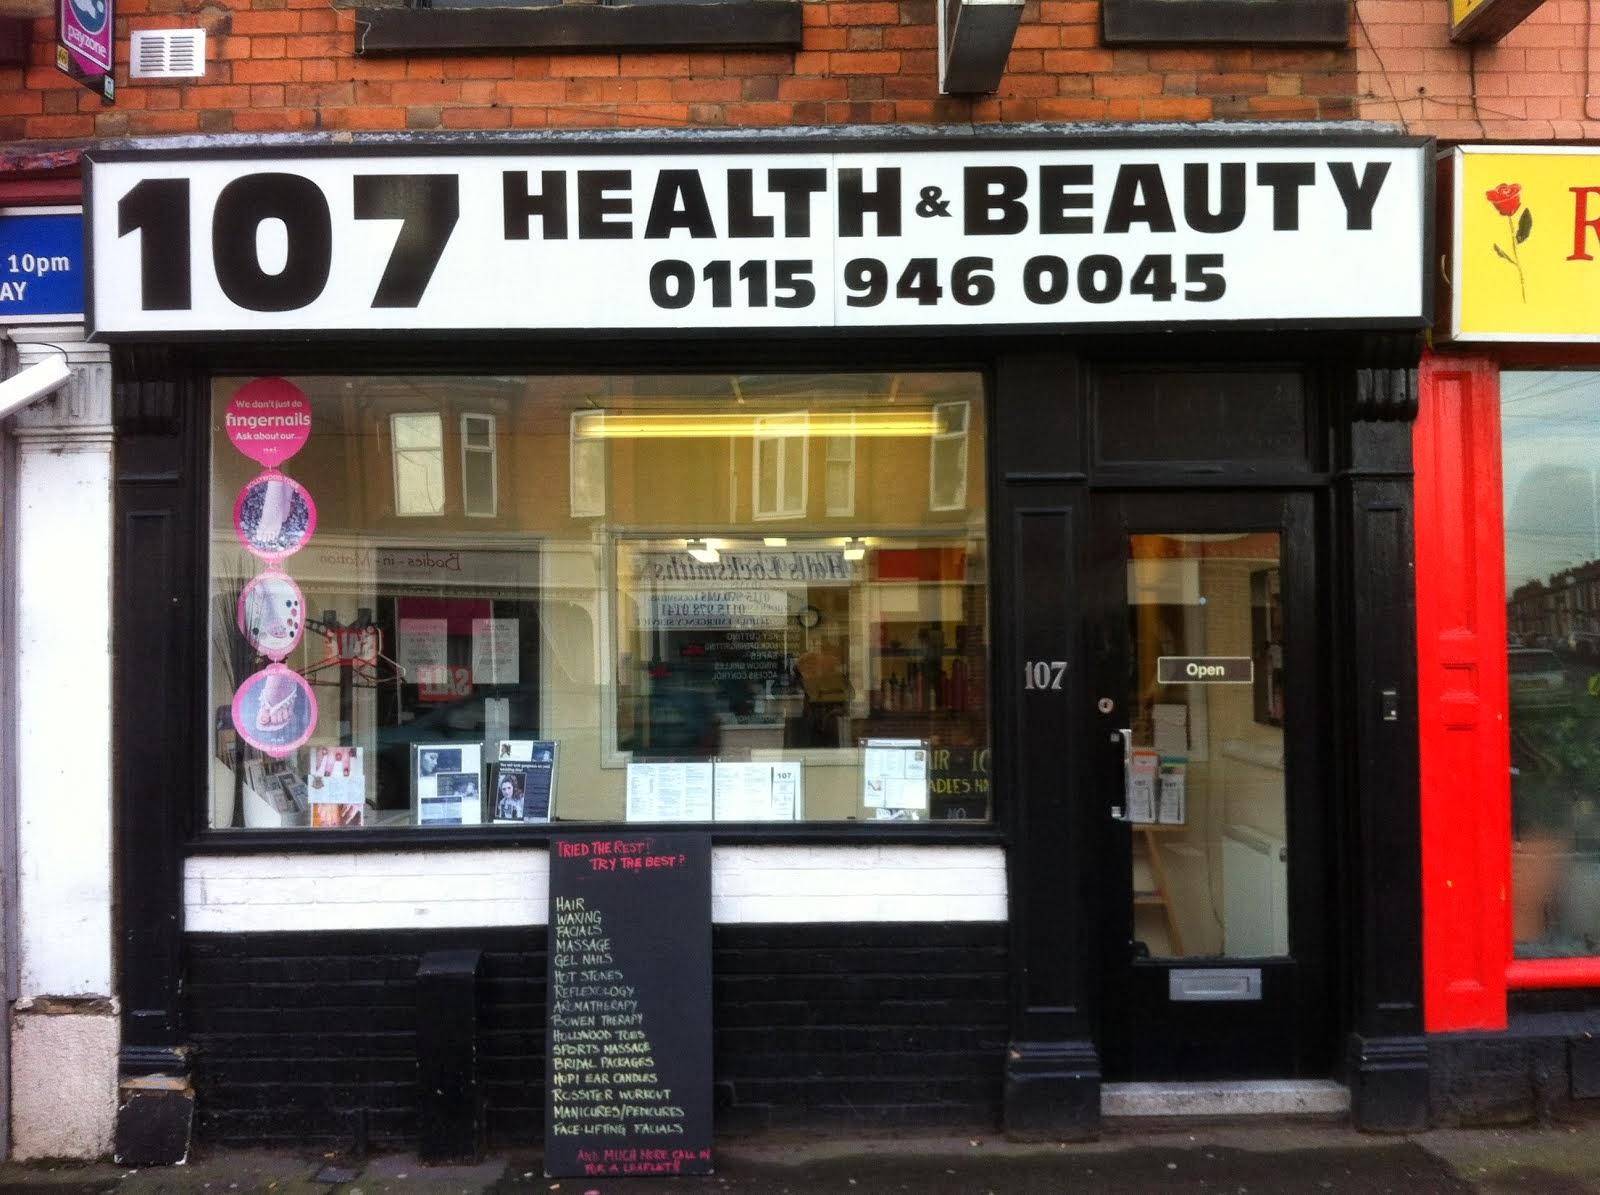 HEALTH & BEAUTY+